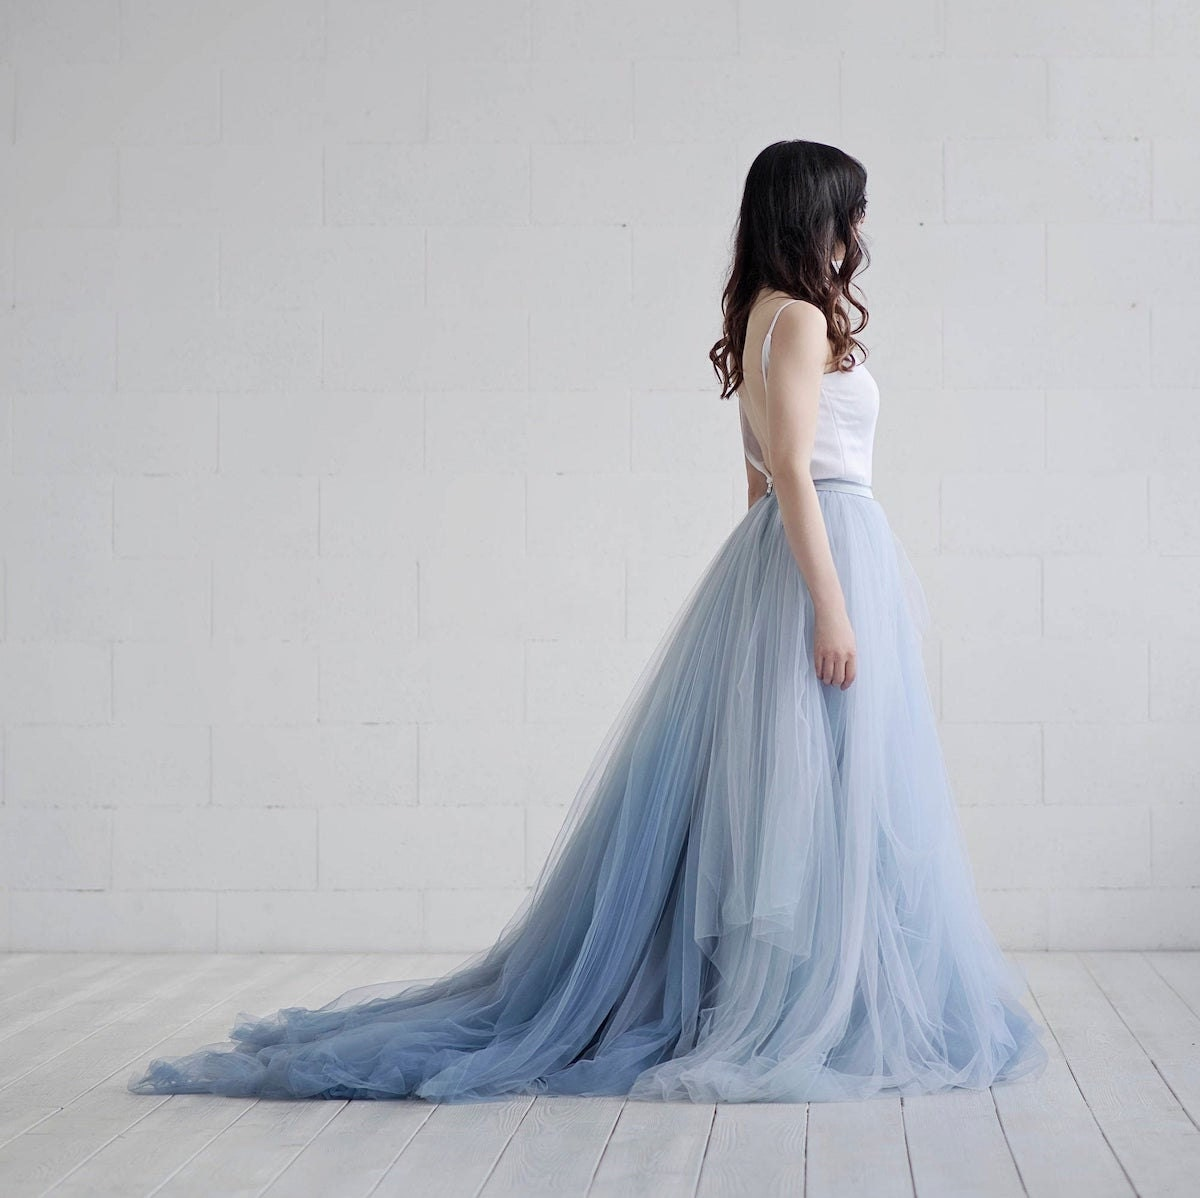 Nora tulle skirt from Wardrobe by Dulcinea